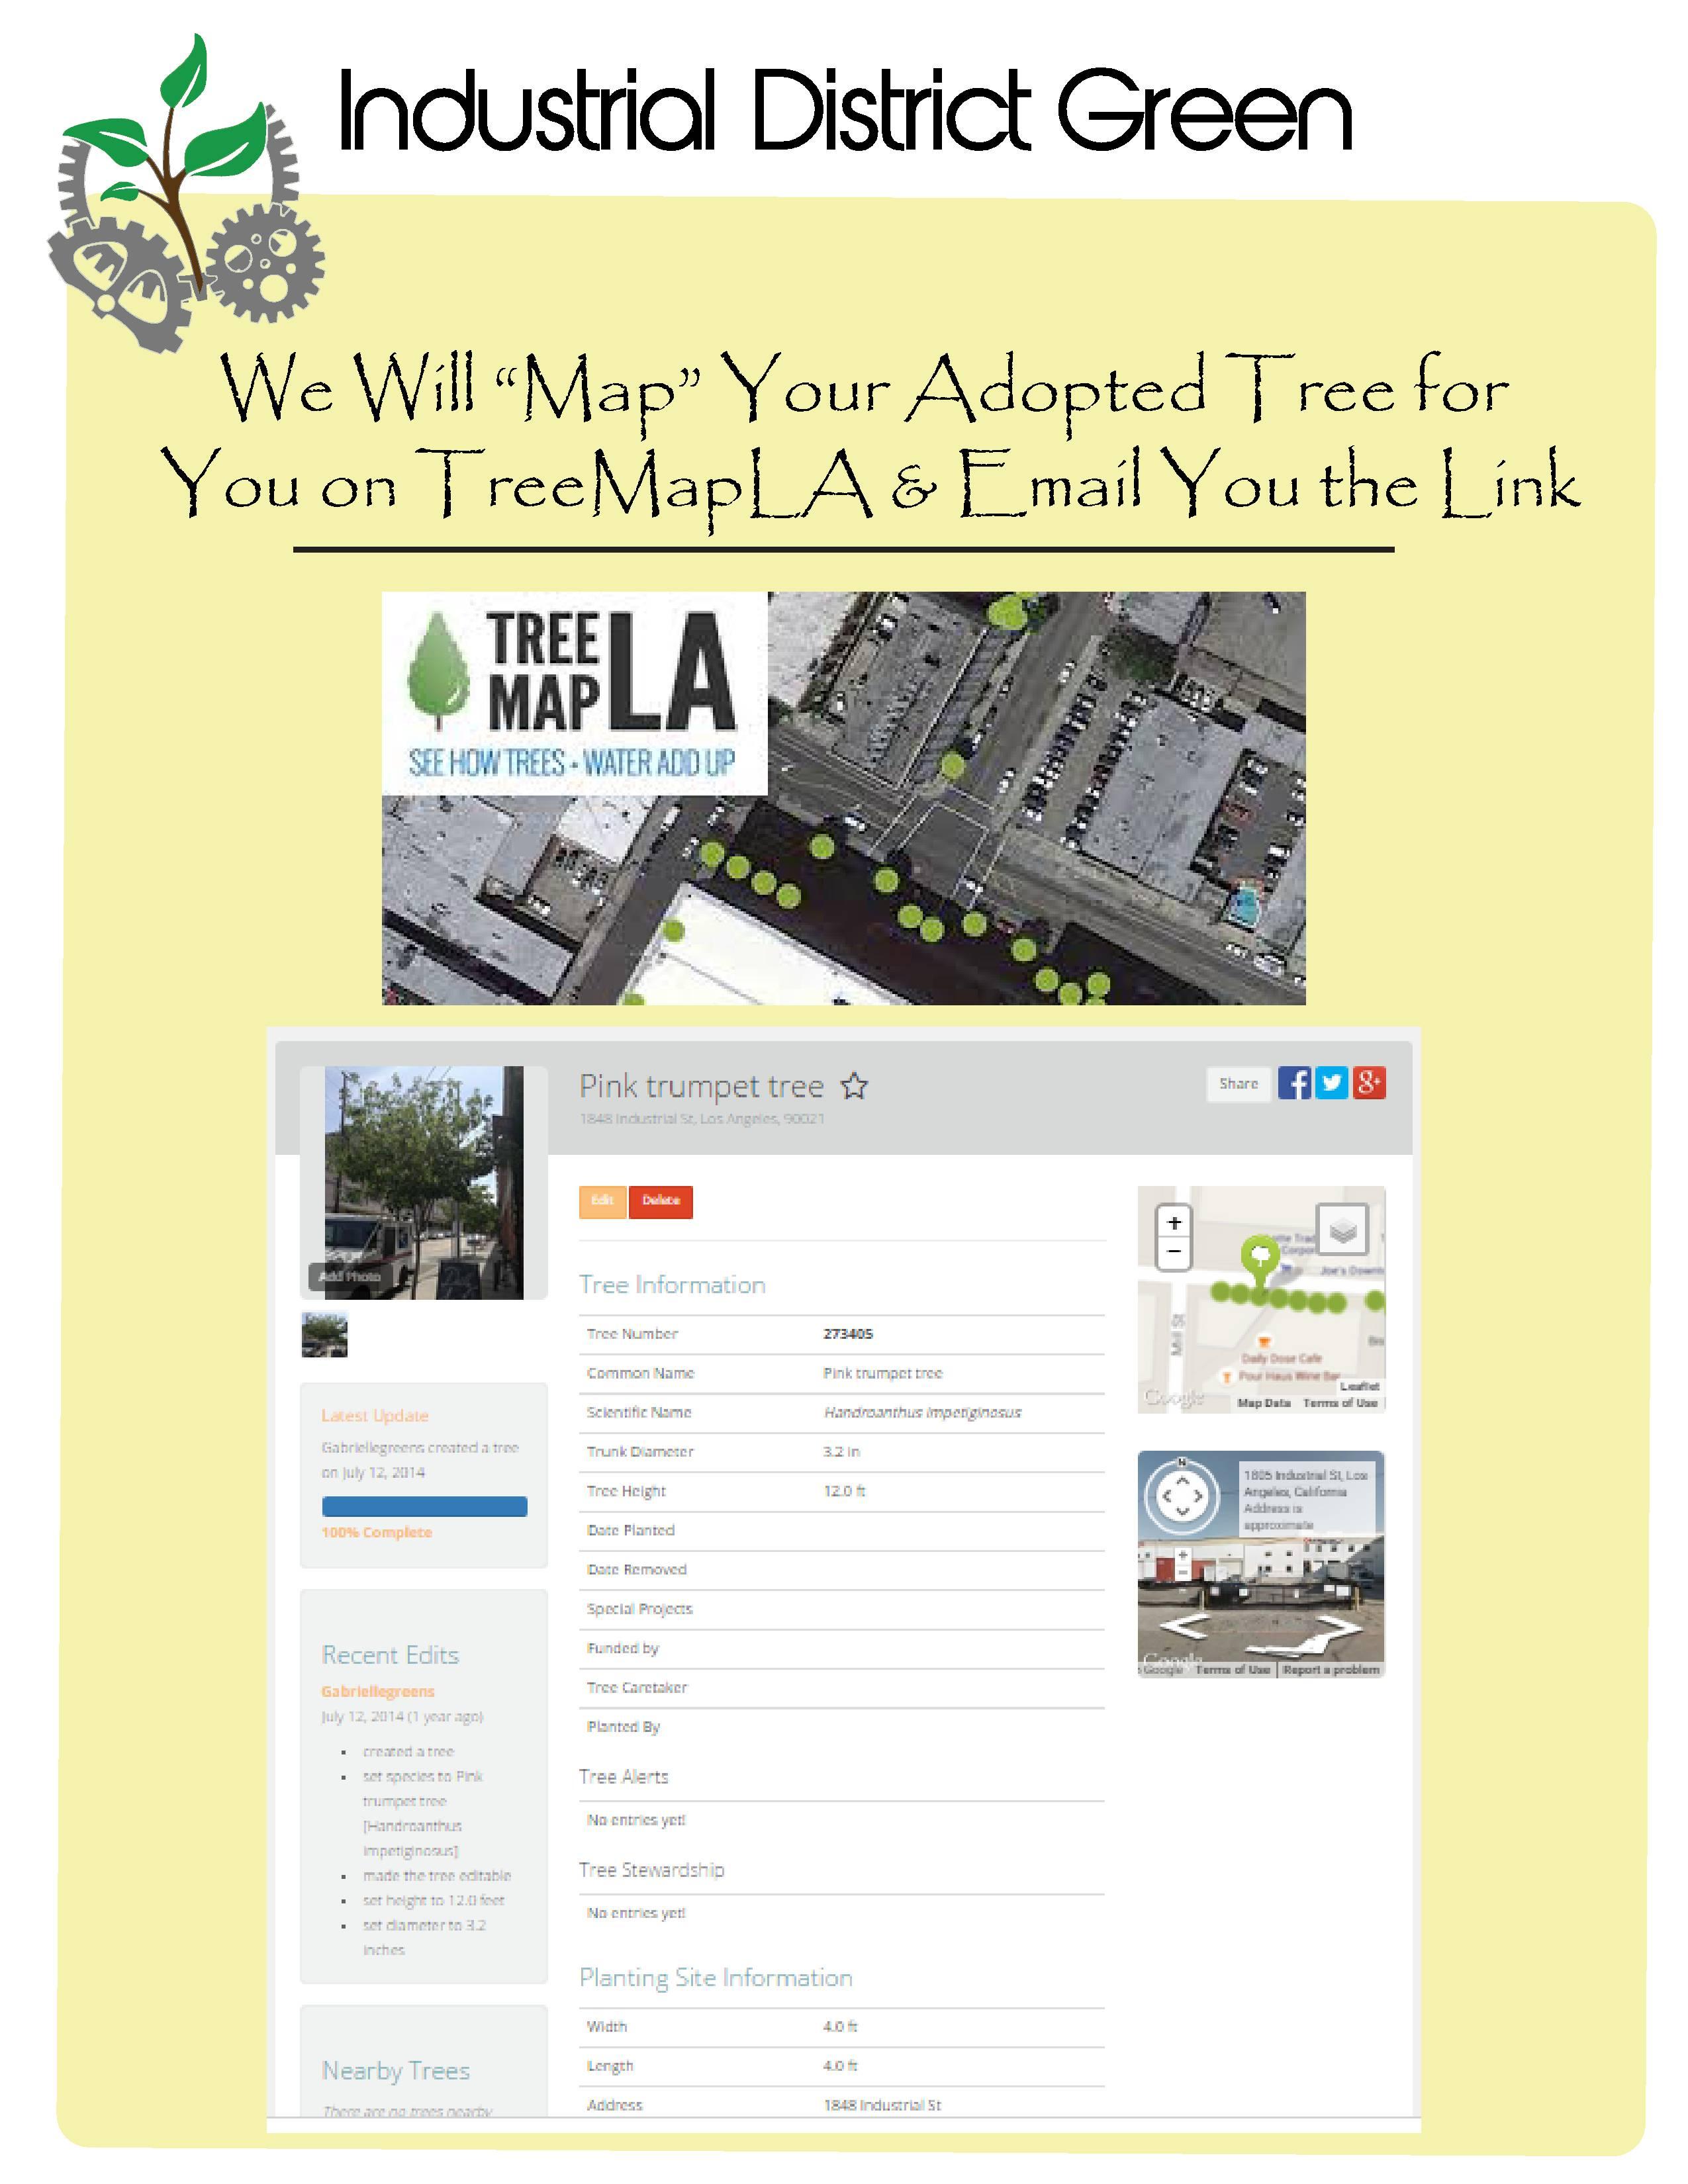 treemapLA_adopt-a-tree.jpg